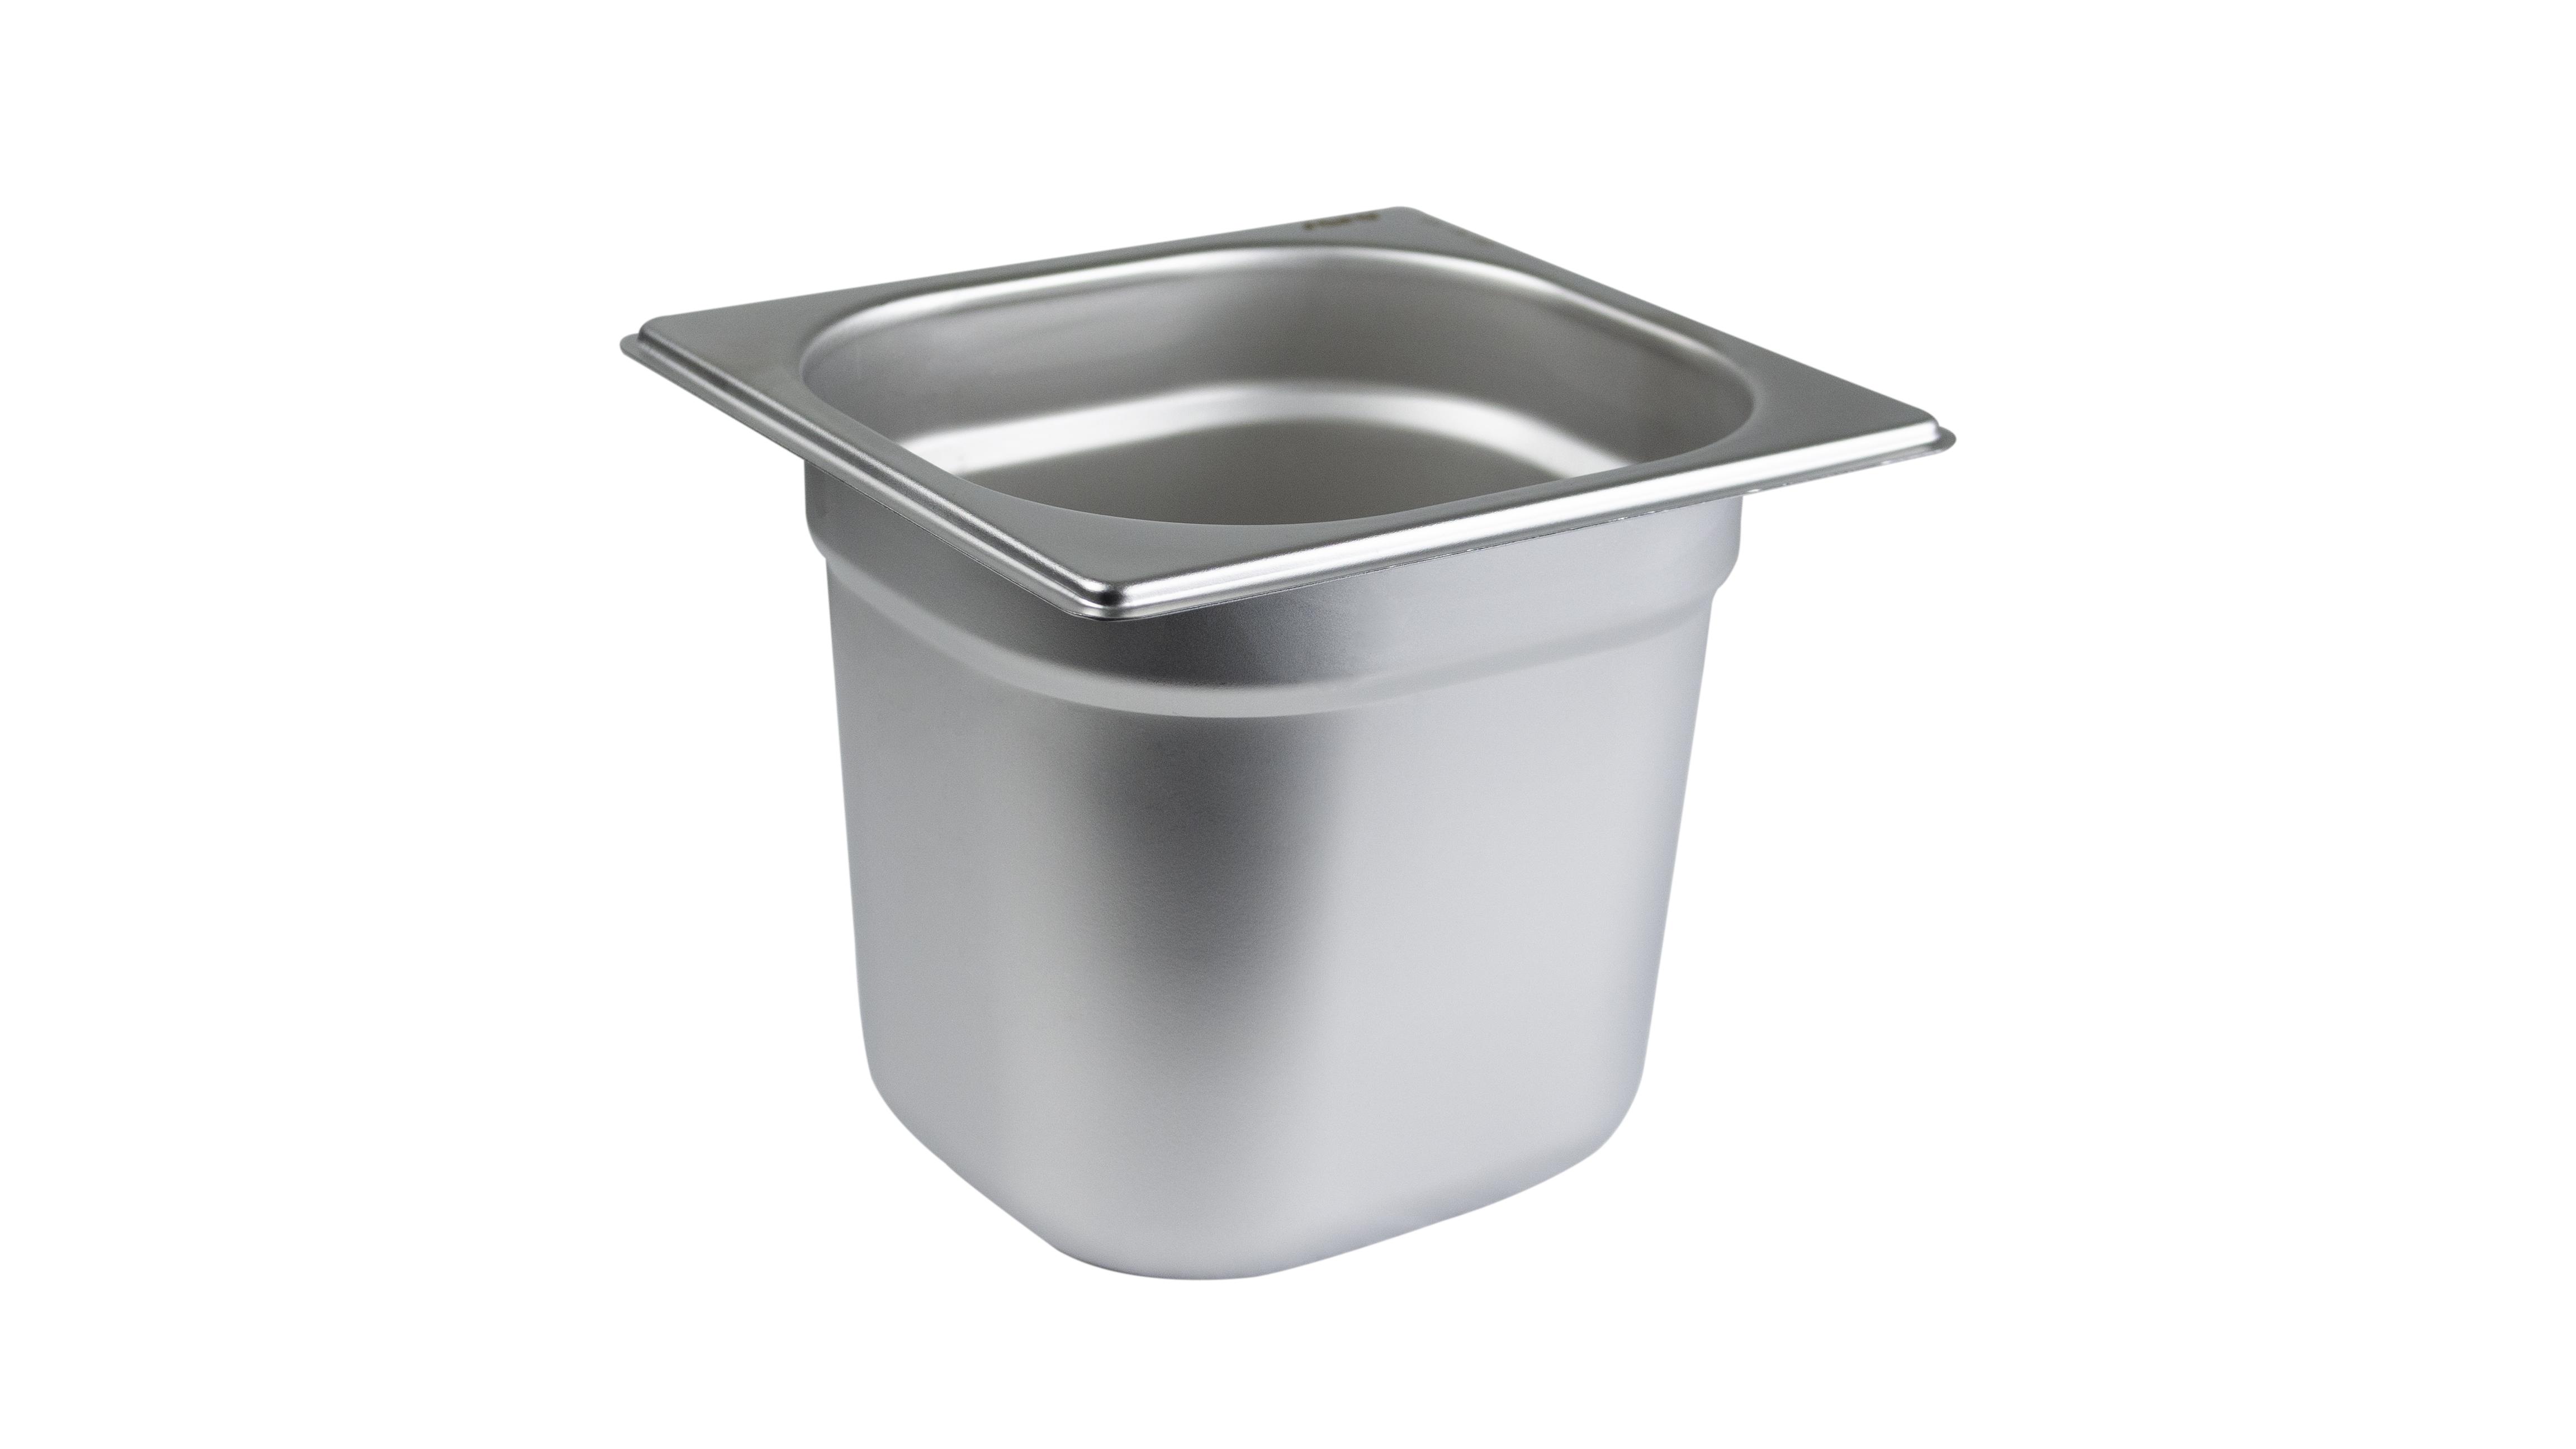 SARO 1/6 GN-Behälter, Edelstahl 14/4, Tiefe: 150 mm